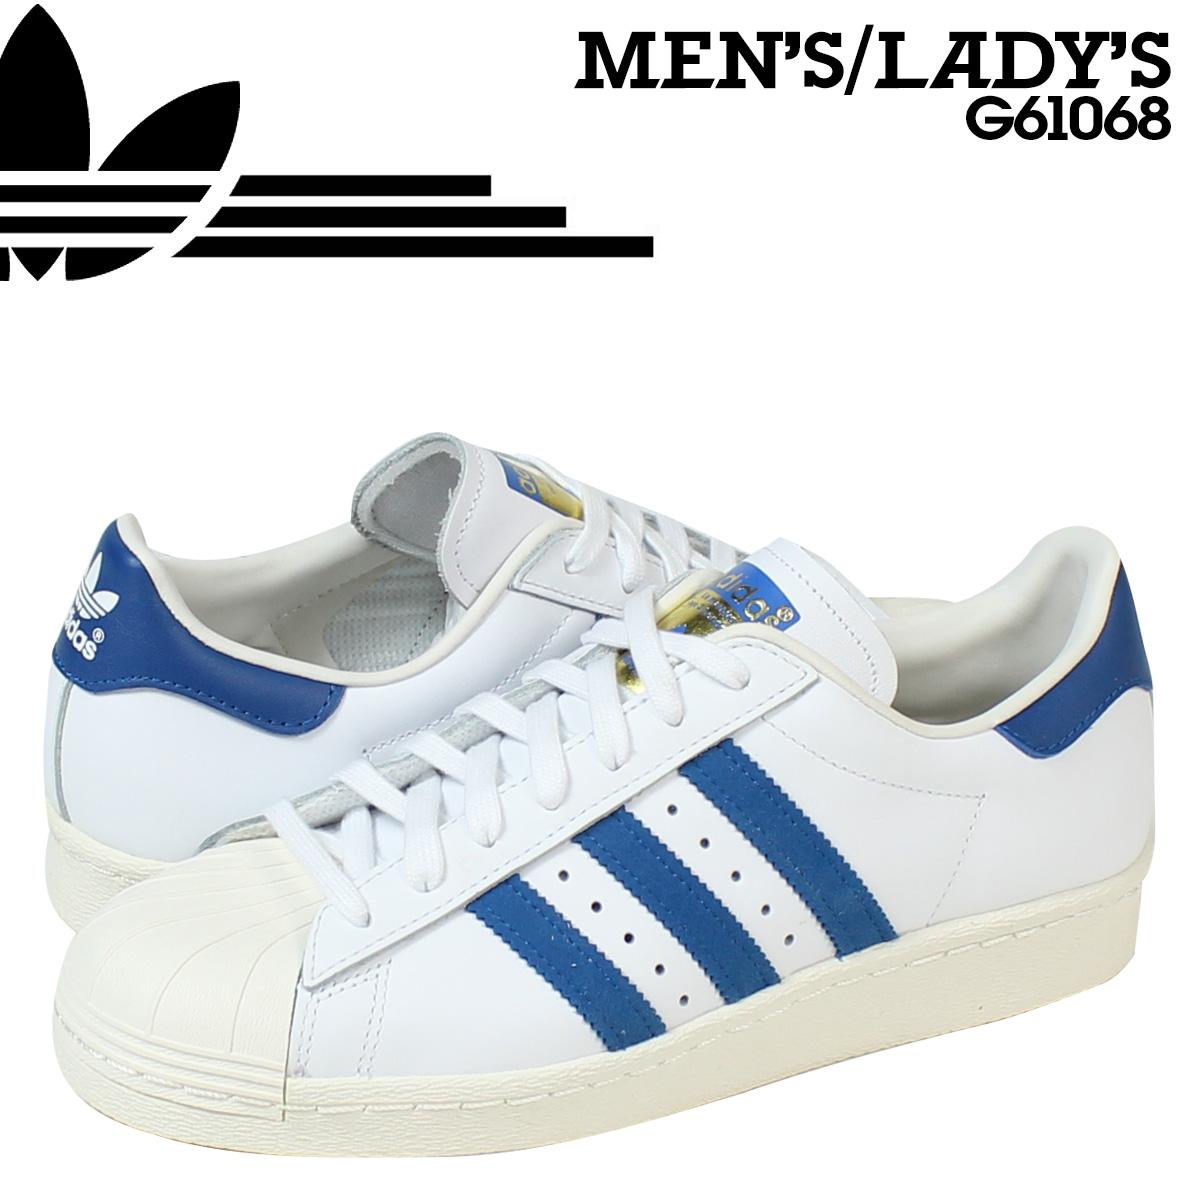 ALLSPORTS: Adidas originals adidas Originals